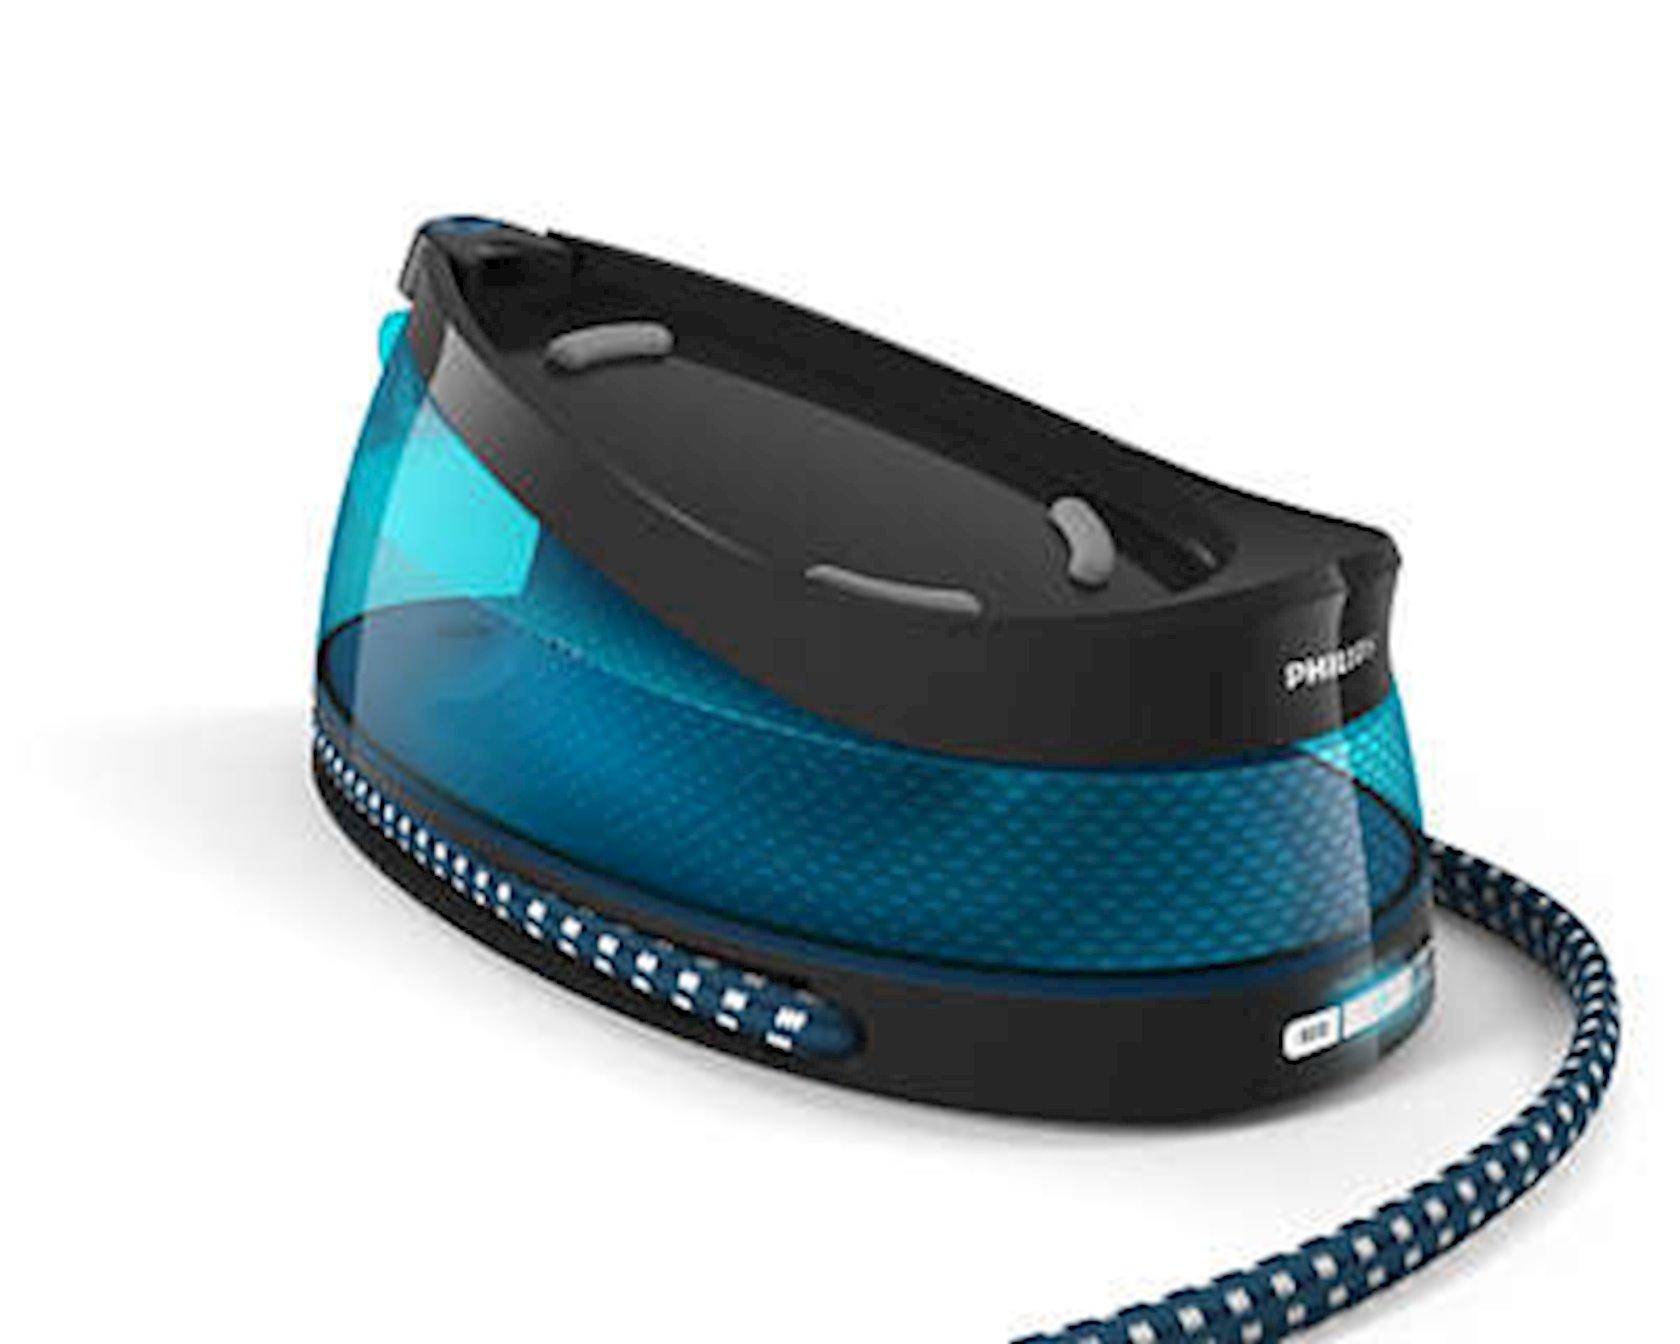 Buxar generatorlu ütü Philips GC7833 PerfectCare Compact